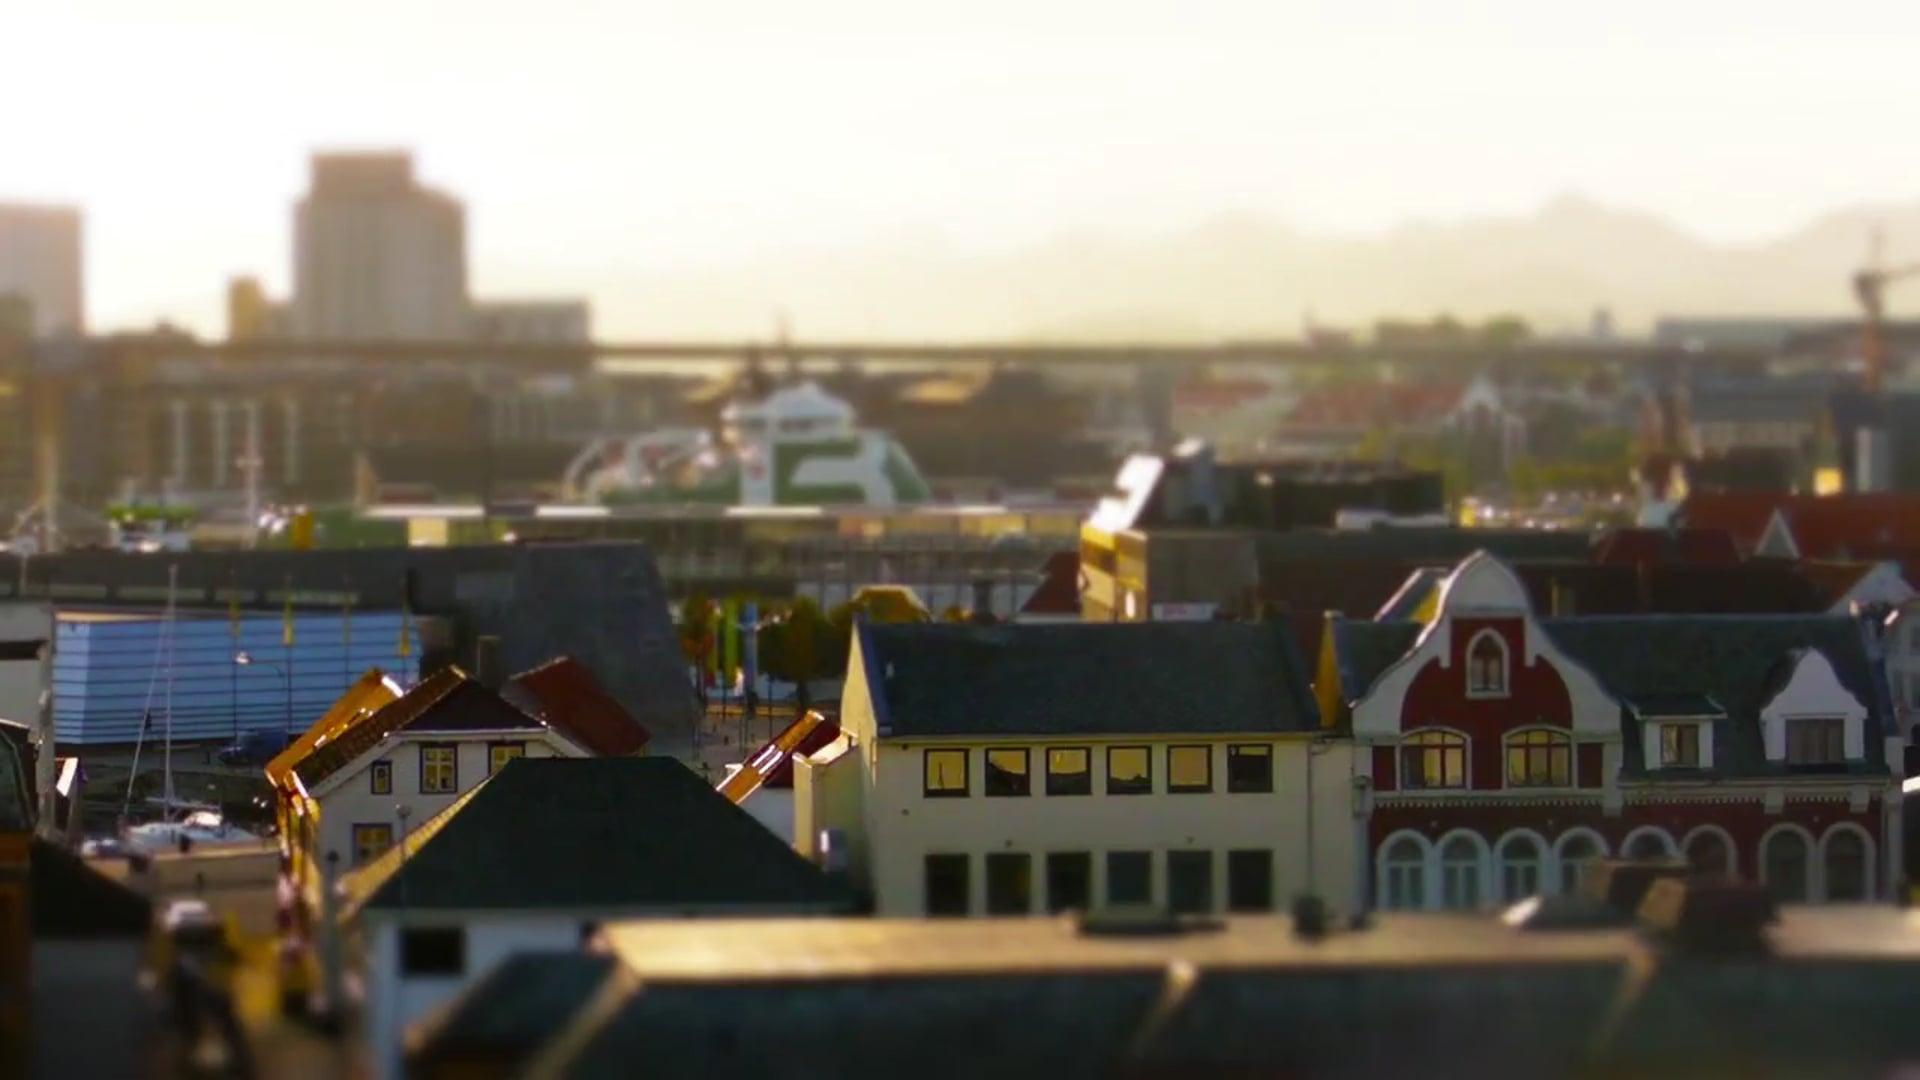 Mini Norway - a Tilt Shift Movie by Davide Vasta